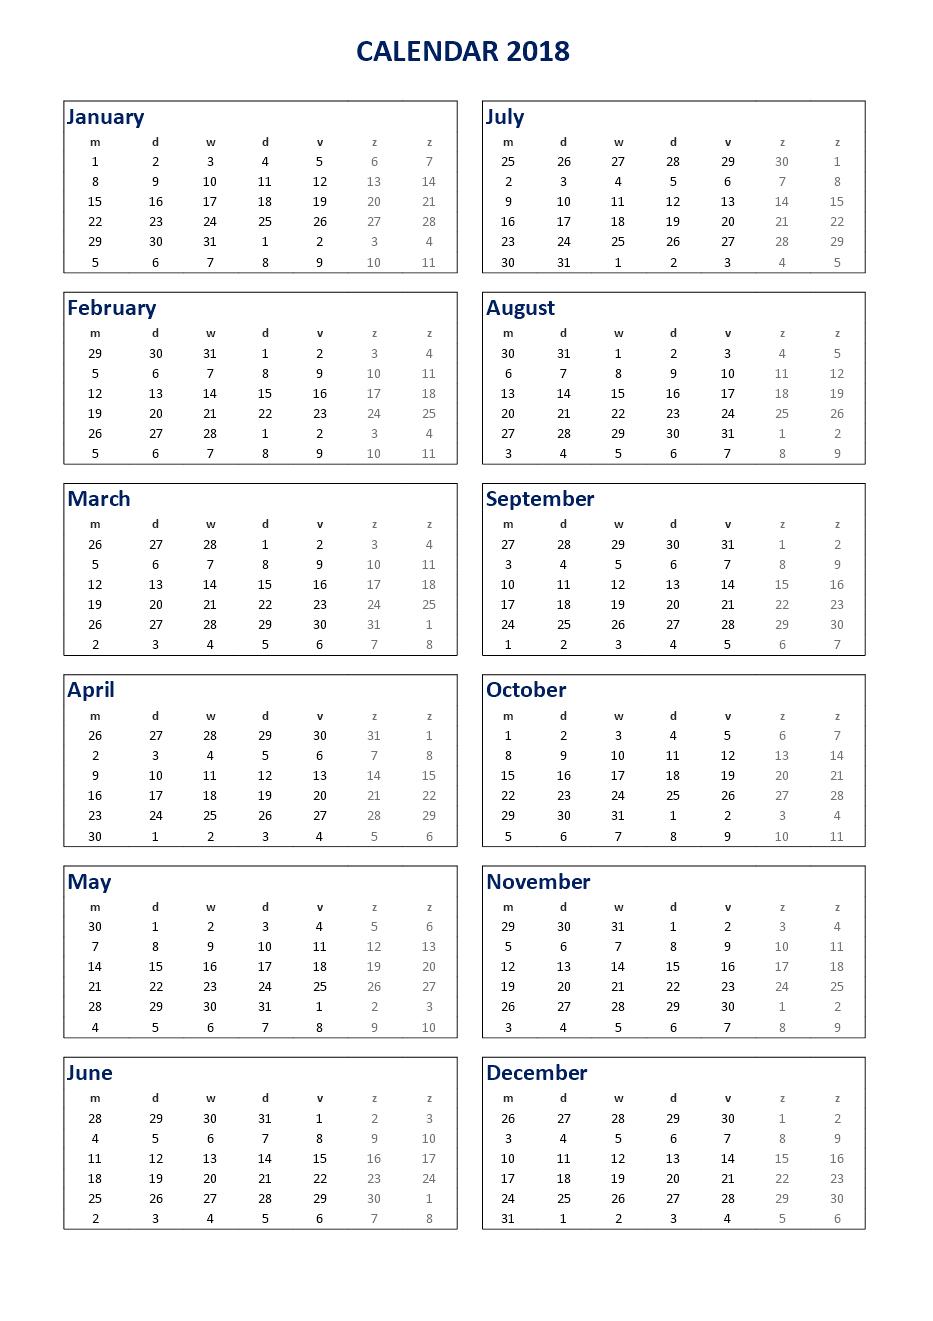 excel calendar 2018 templates